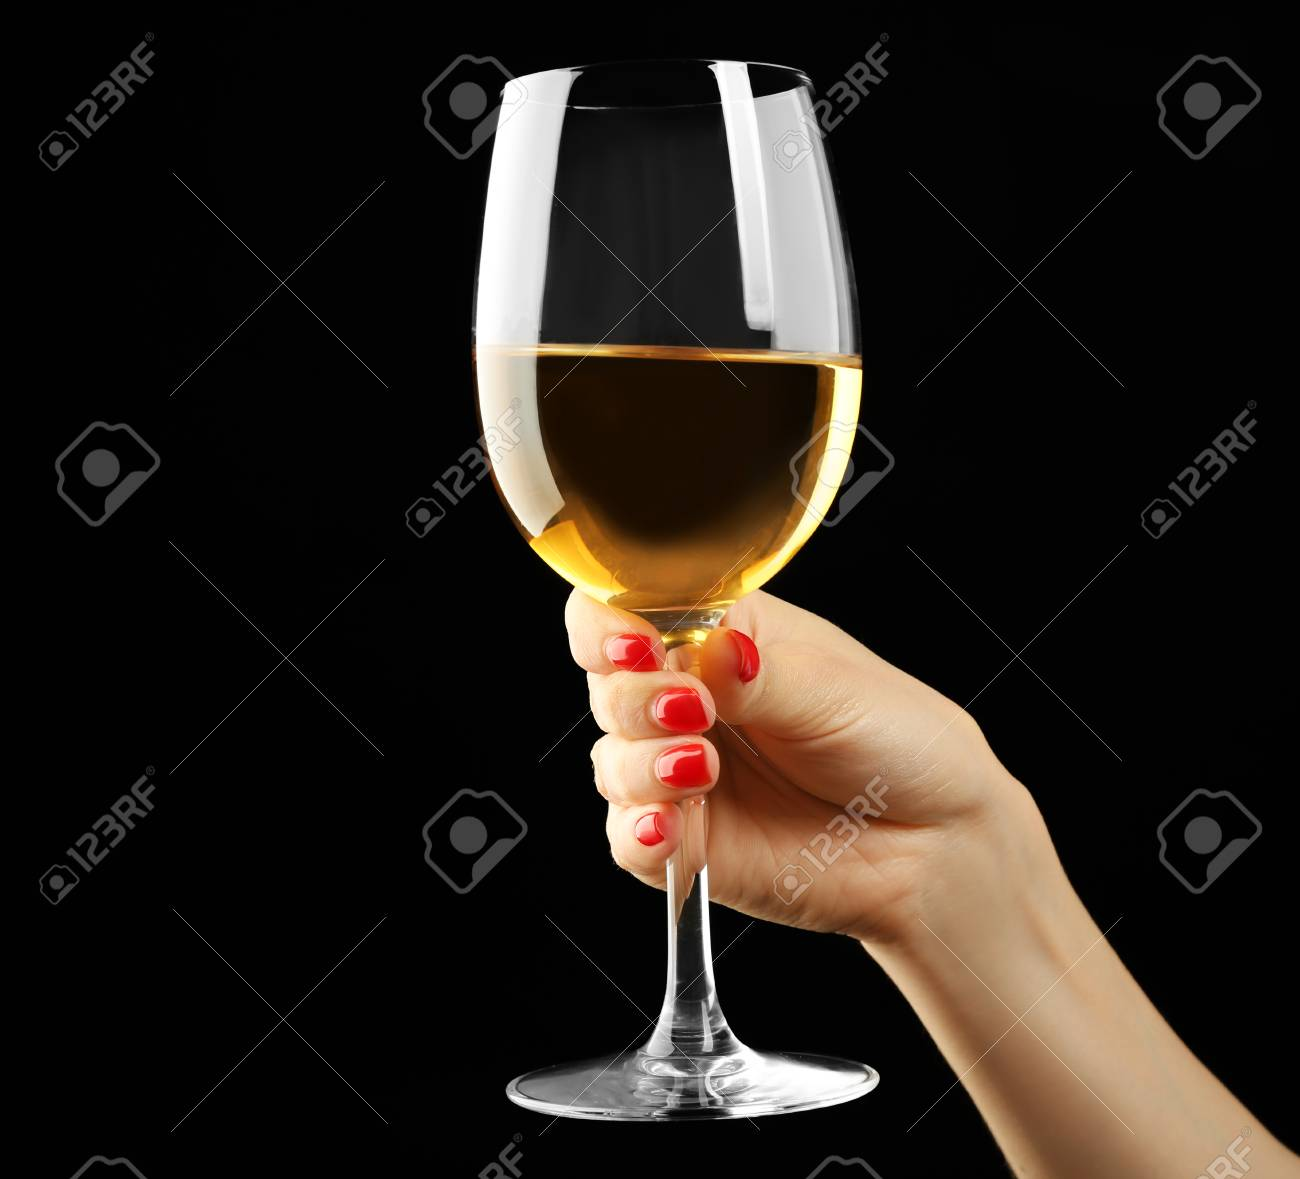 61db769402c2 Female hand holding glass of wine on black background Stock Photo - 96039431